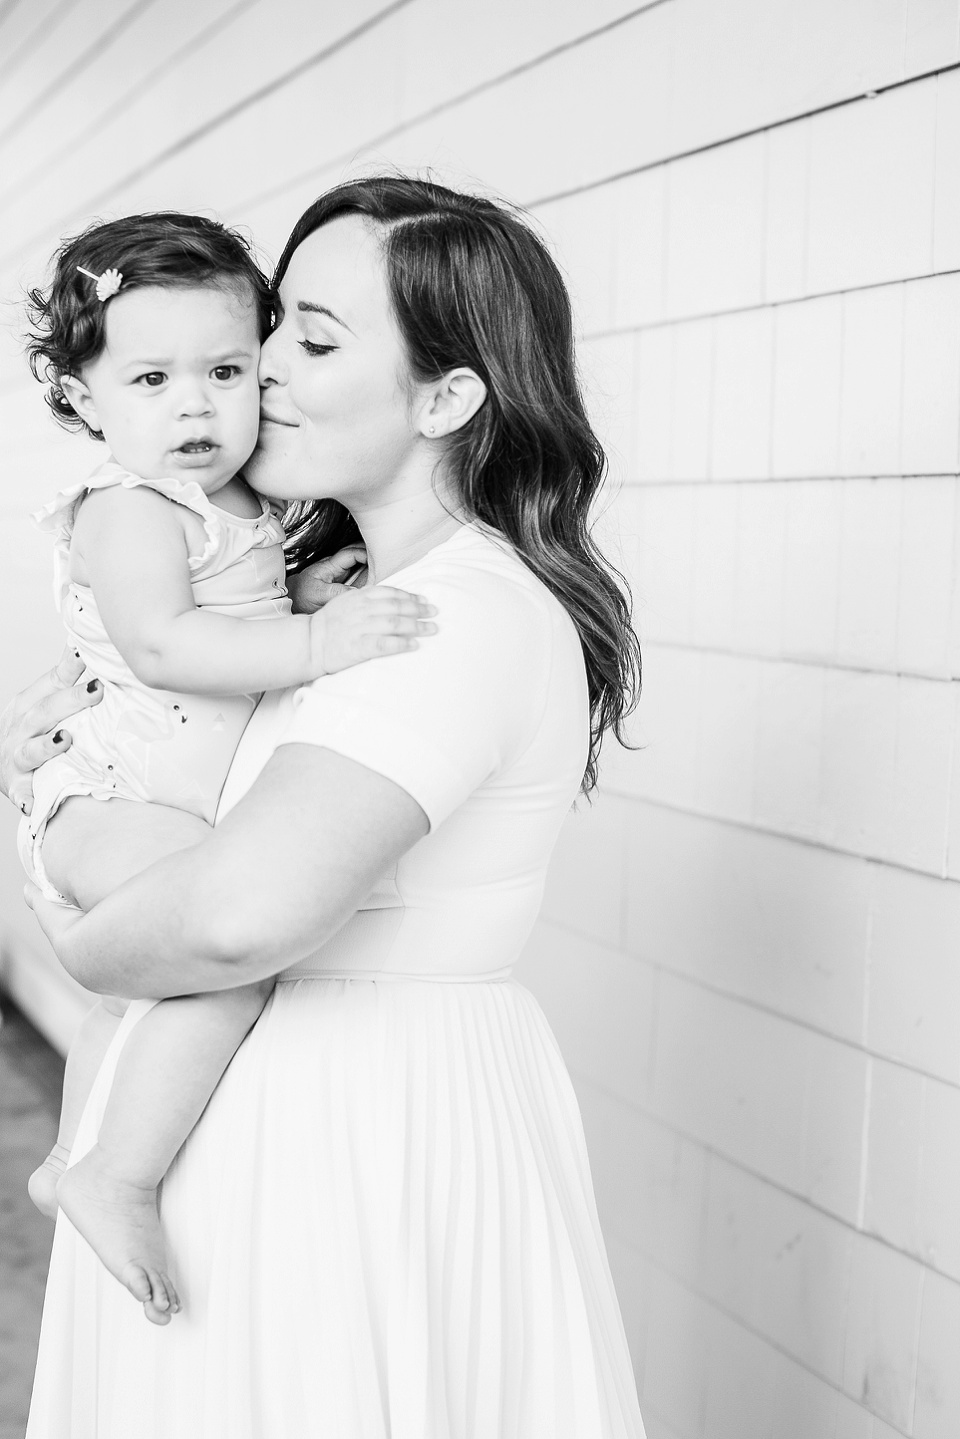 ljp_los angeles lifestyle family photographer_073